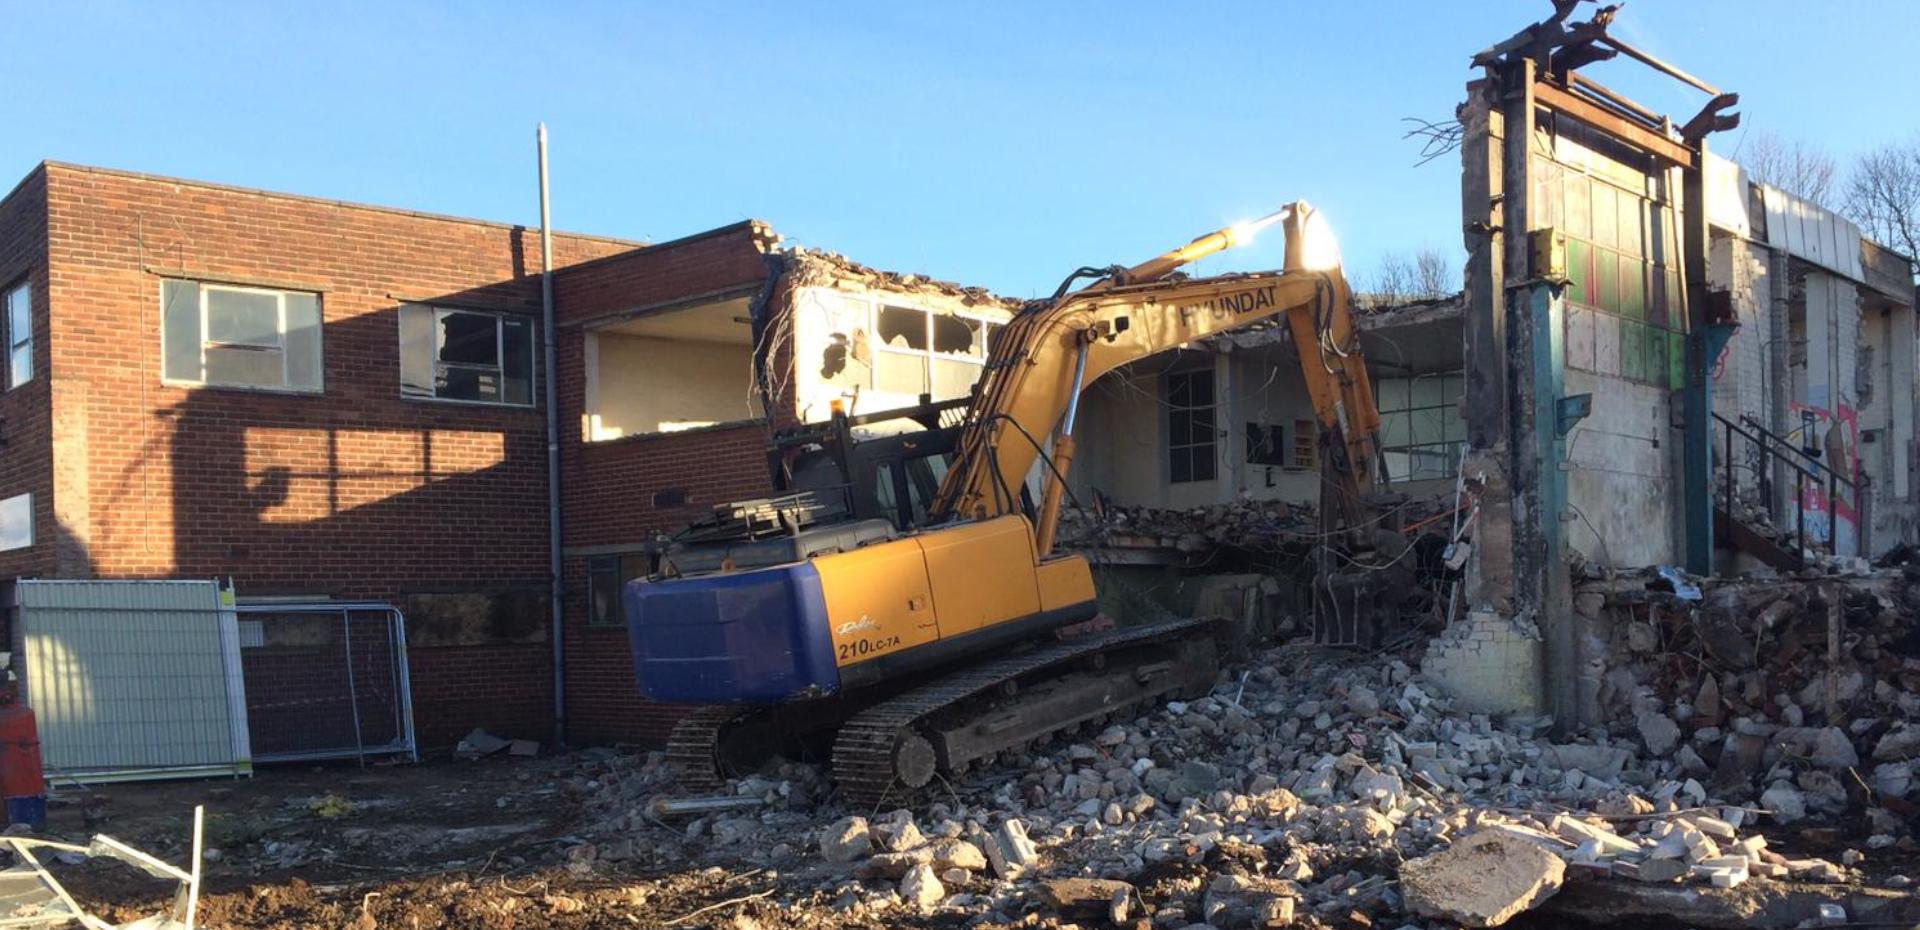 Demolition Company Manchester